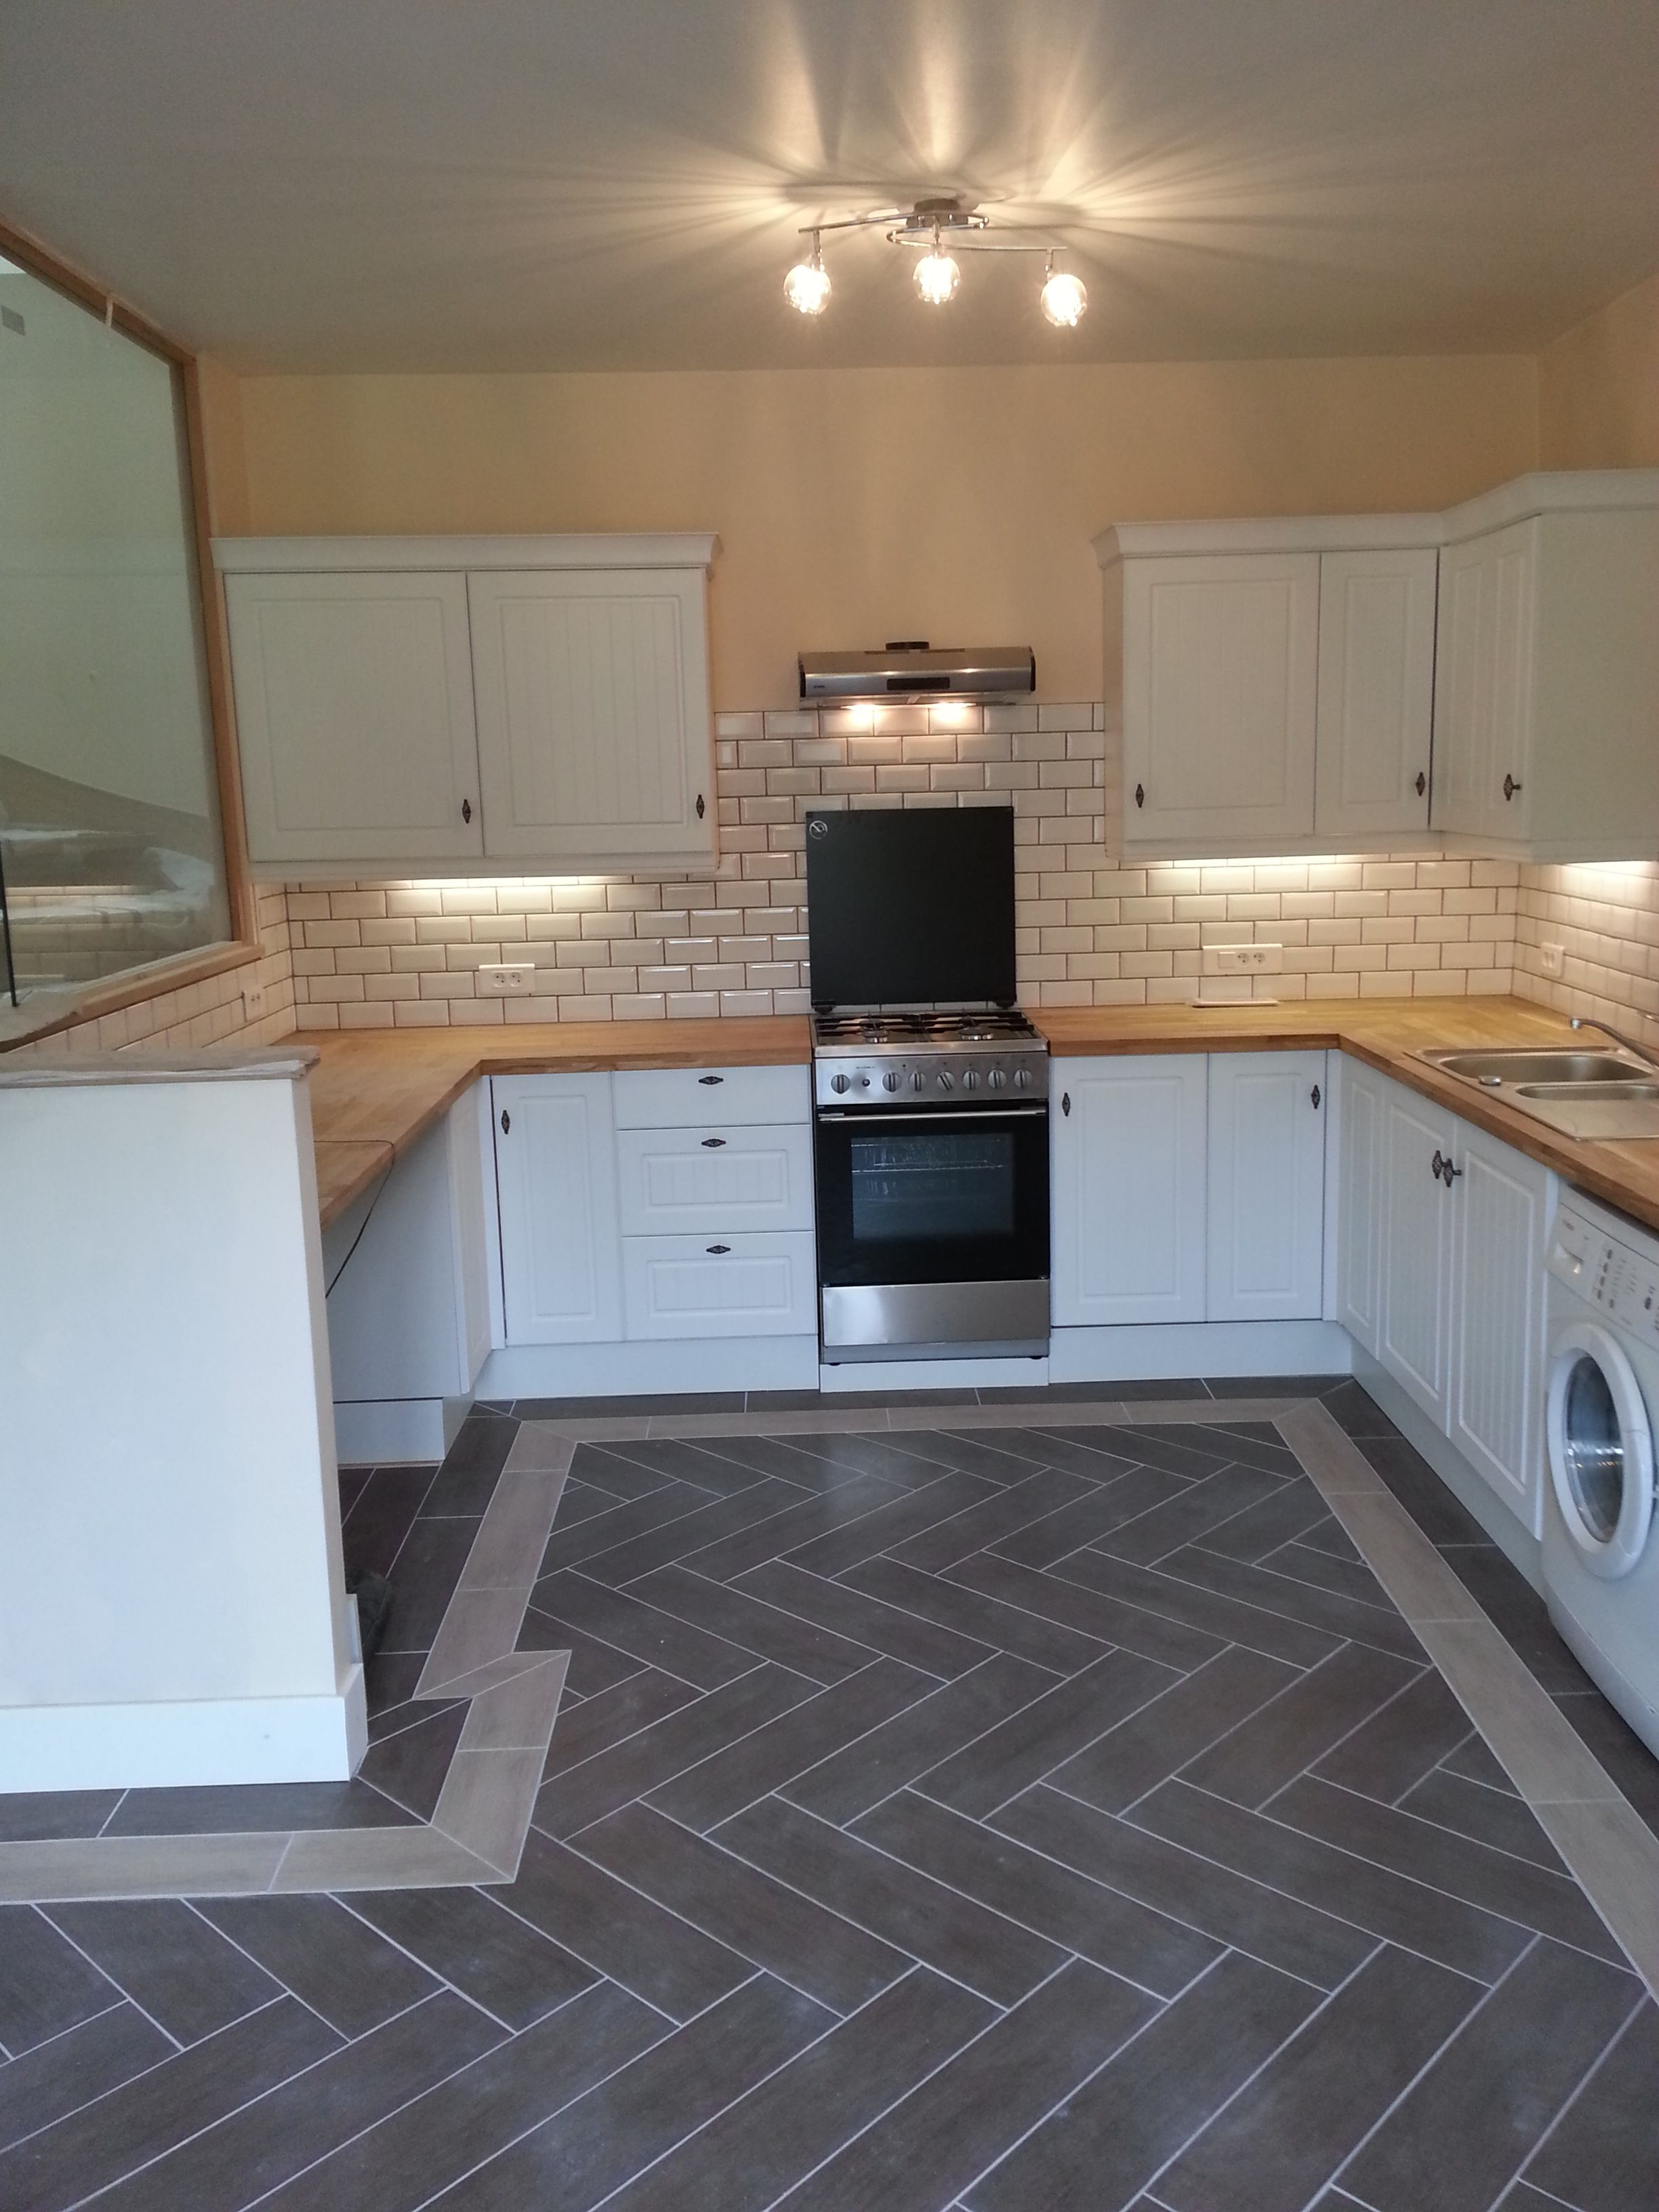 New B&Q Country Style Kitchen, herringbone tiled floor ...